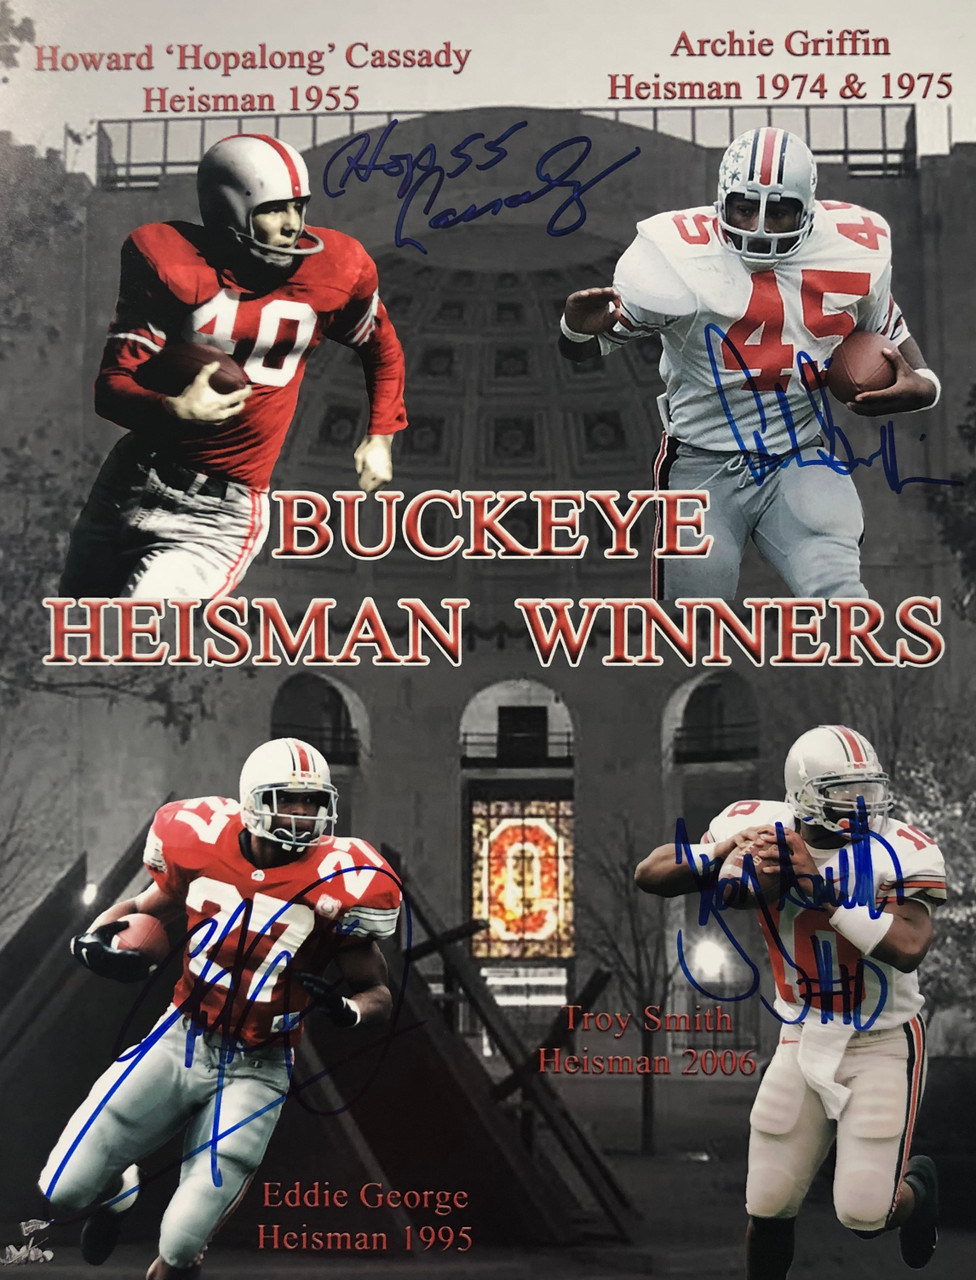 4 Heisman Winners Ohio State Buckeyes 11-1 11x14 Autographed Photo - Certified Authentic